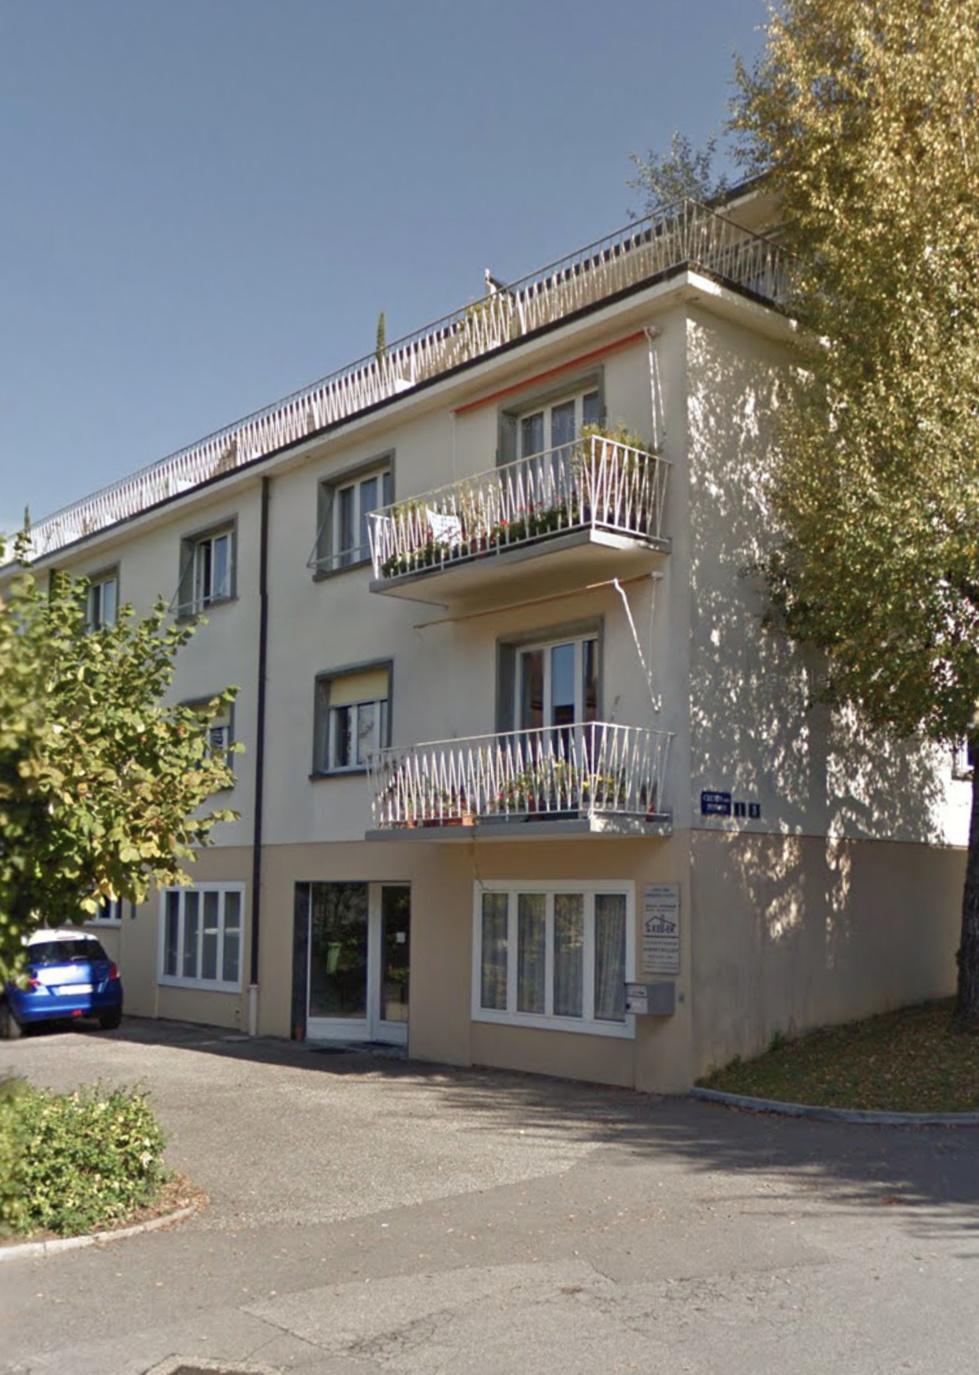 Pinsons 1-3, 1012 Lausanne